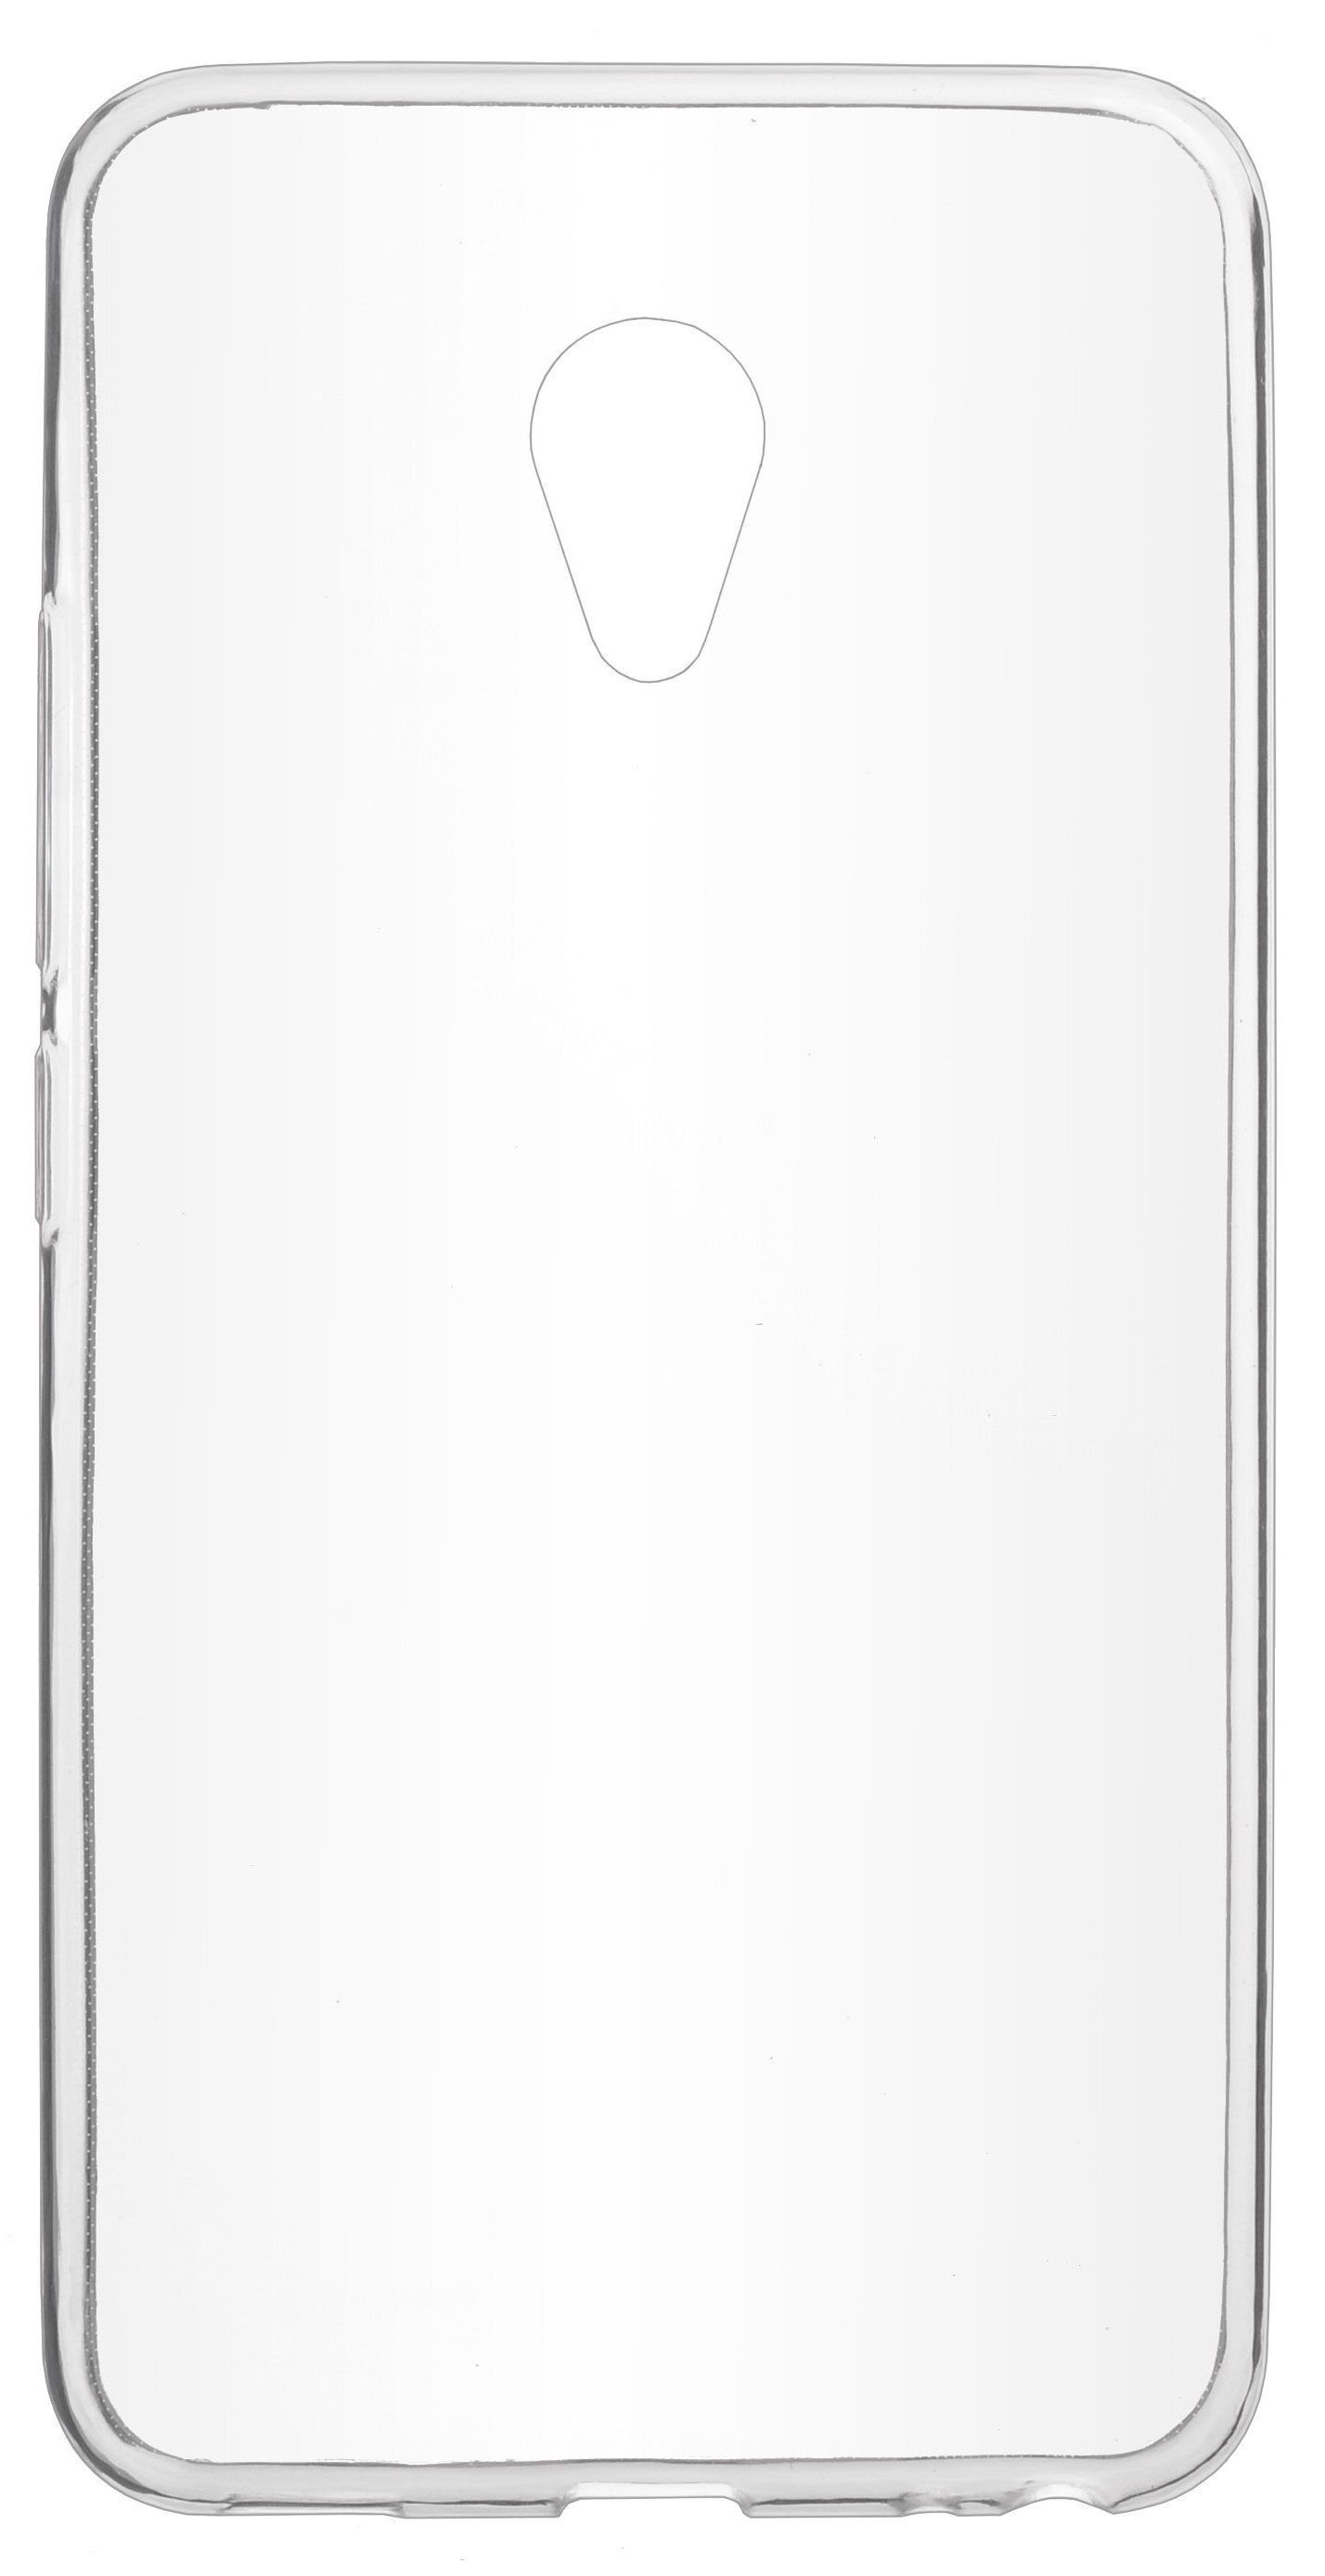 Чехол для сотового телефона skinBOX Slim Silicone, 4630042529380, прозрачный цена и фото